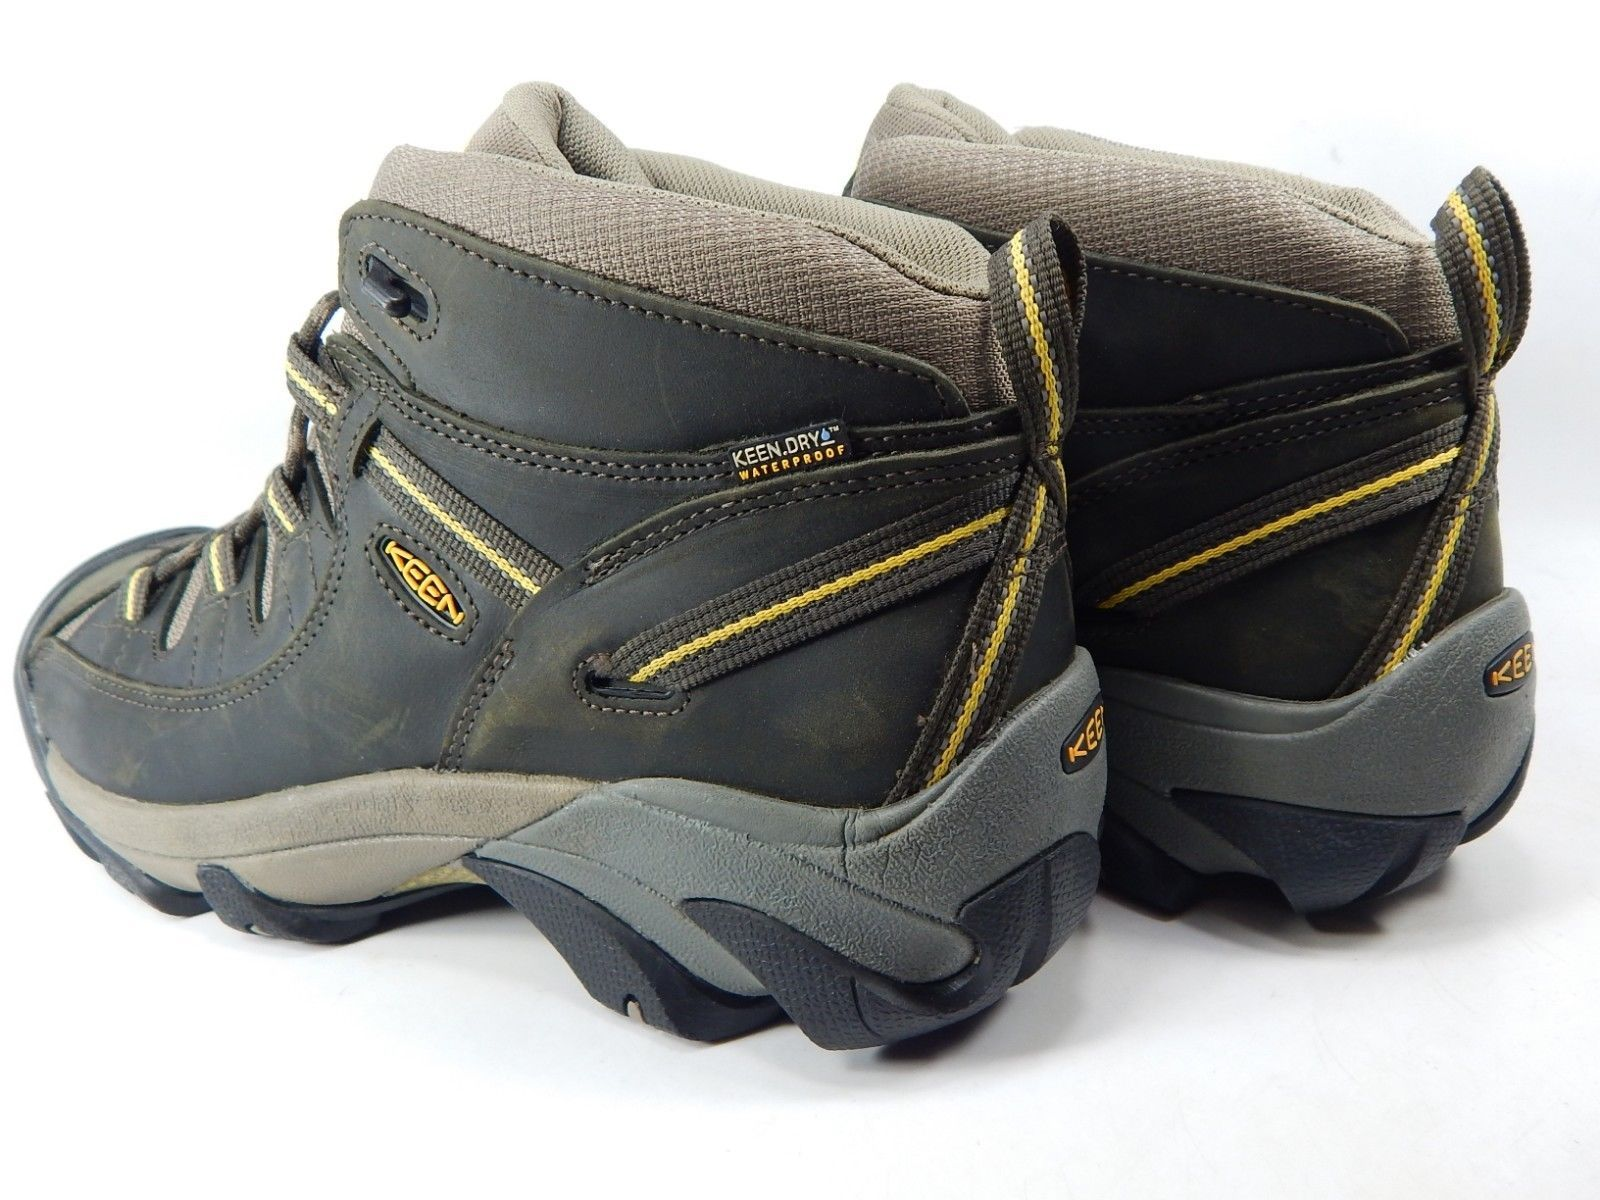 Keen Targhee II Mid Top Sz 11 M (D) EU 44.5 Men's WP Trail Hiking Boots 1002375